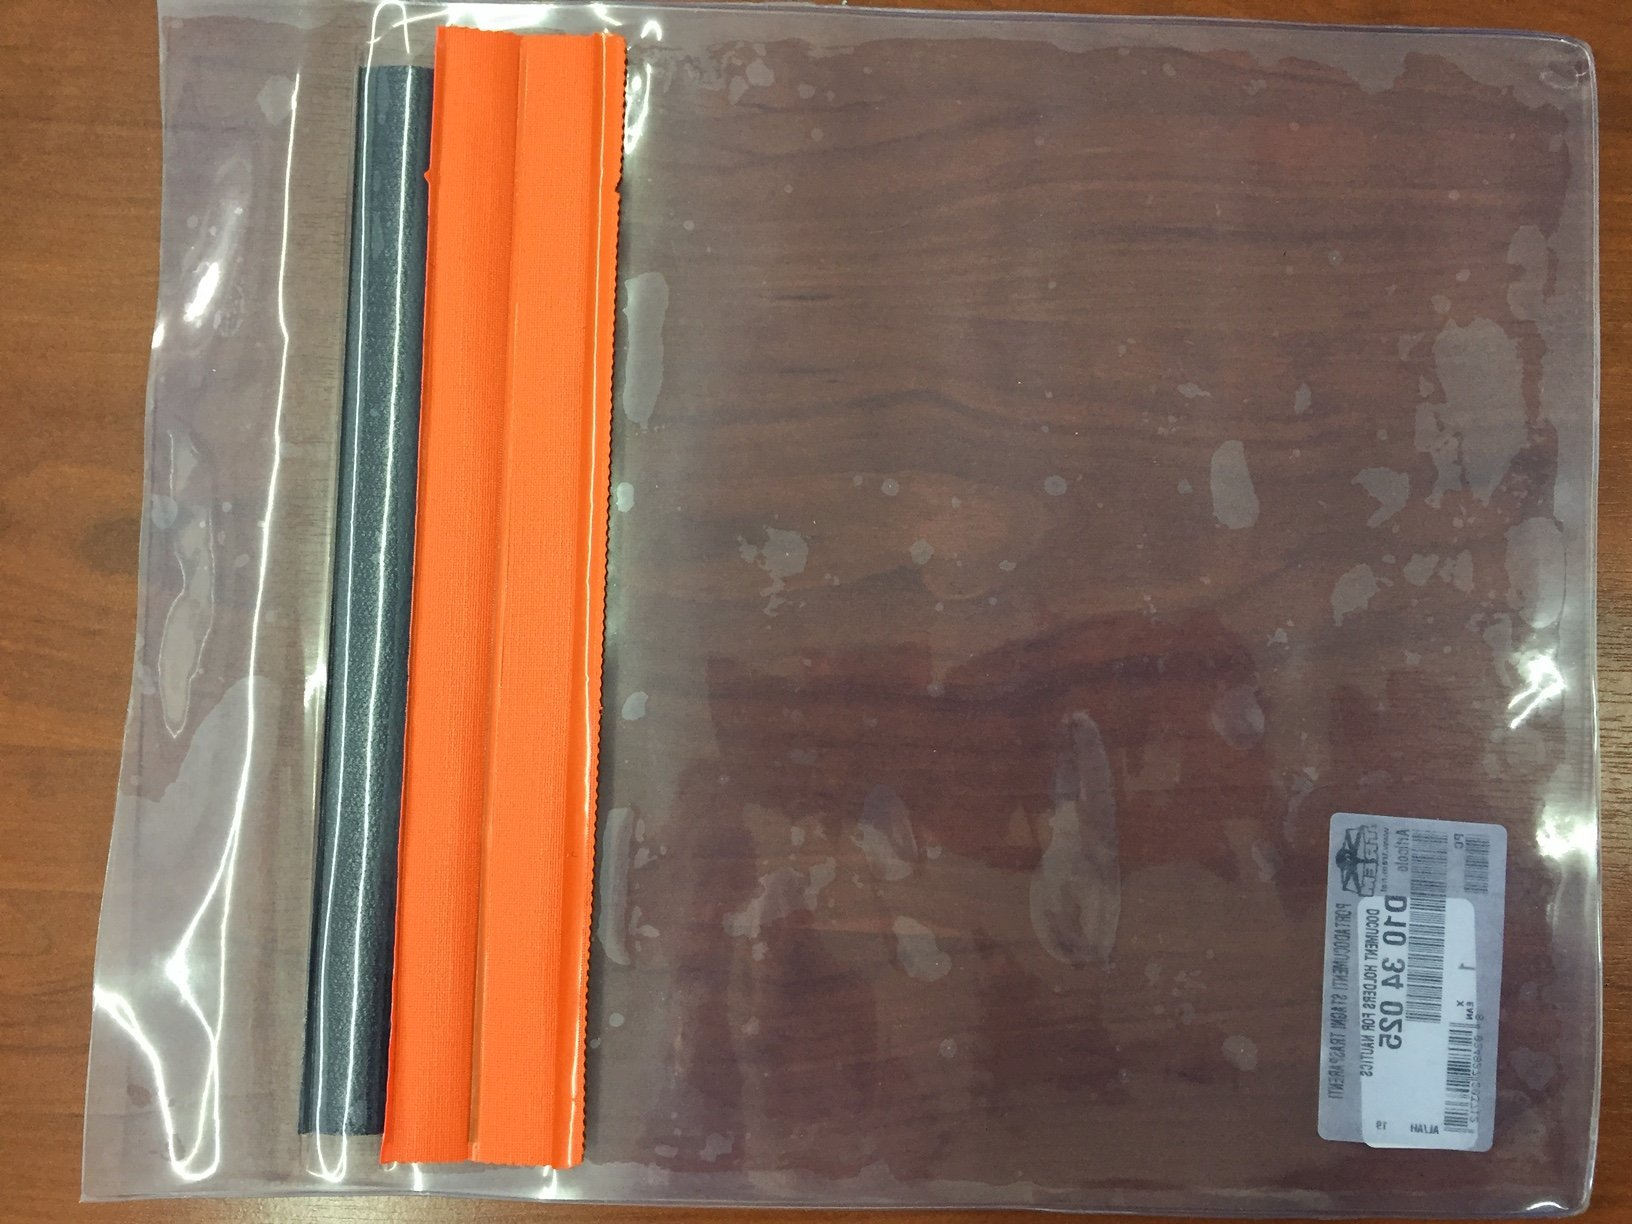 430a3a97703d Πλαστική Αδιάβροχη Θήκη Εγγράφων 28x27cm - Tziolis Blue Marine